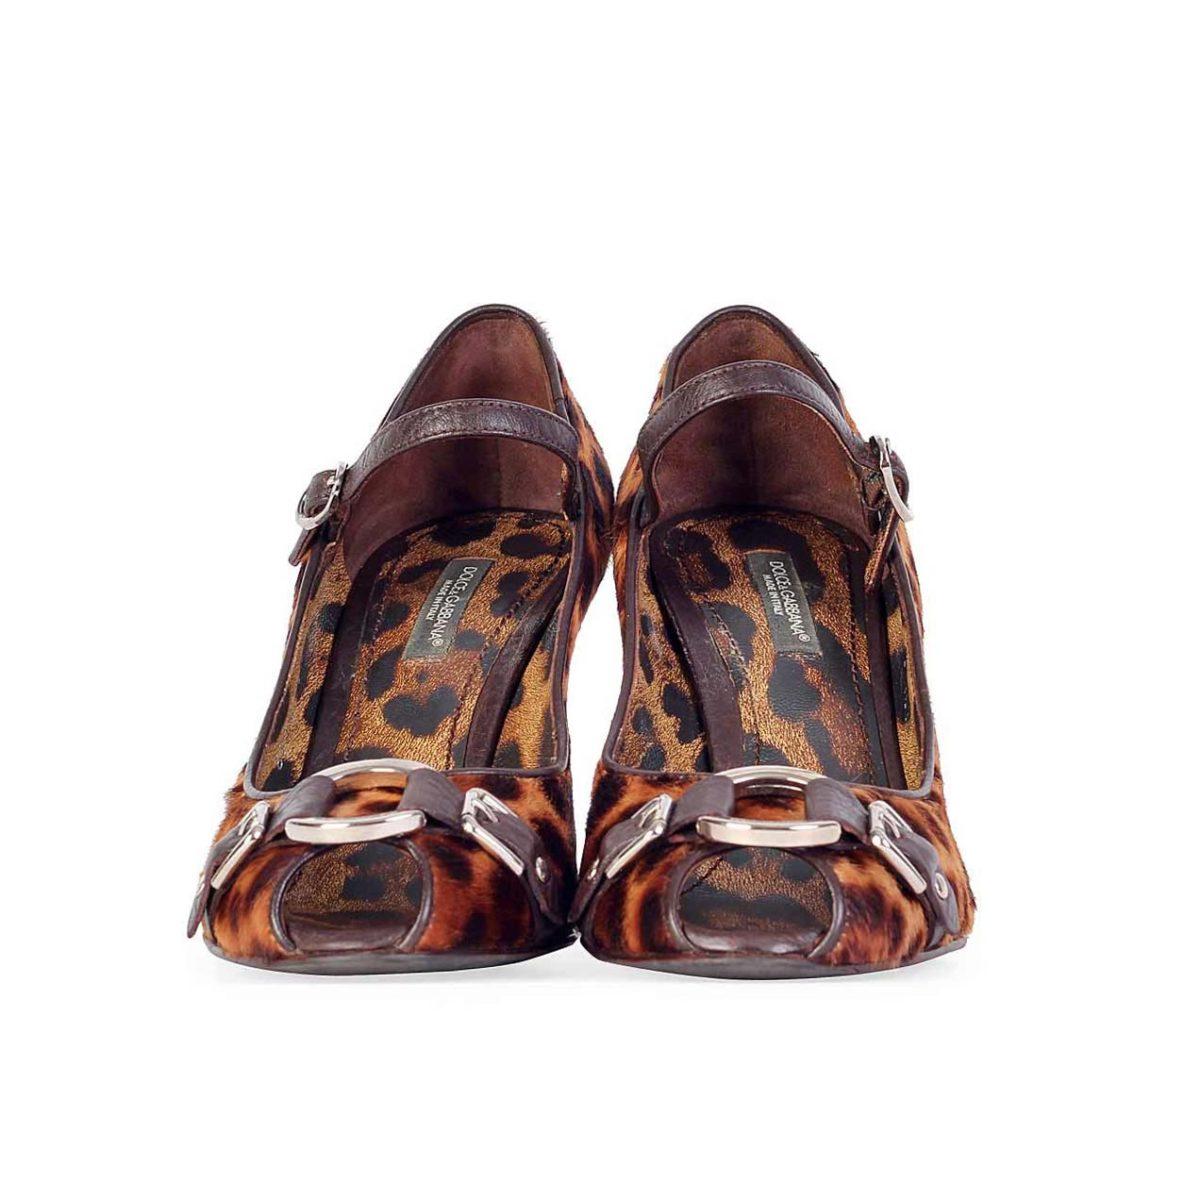 296af19f1614 DOLCE & GABBANA Calf Hair Leopard Print Peep-Toe Heels - S: 36 (3.5 ...